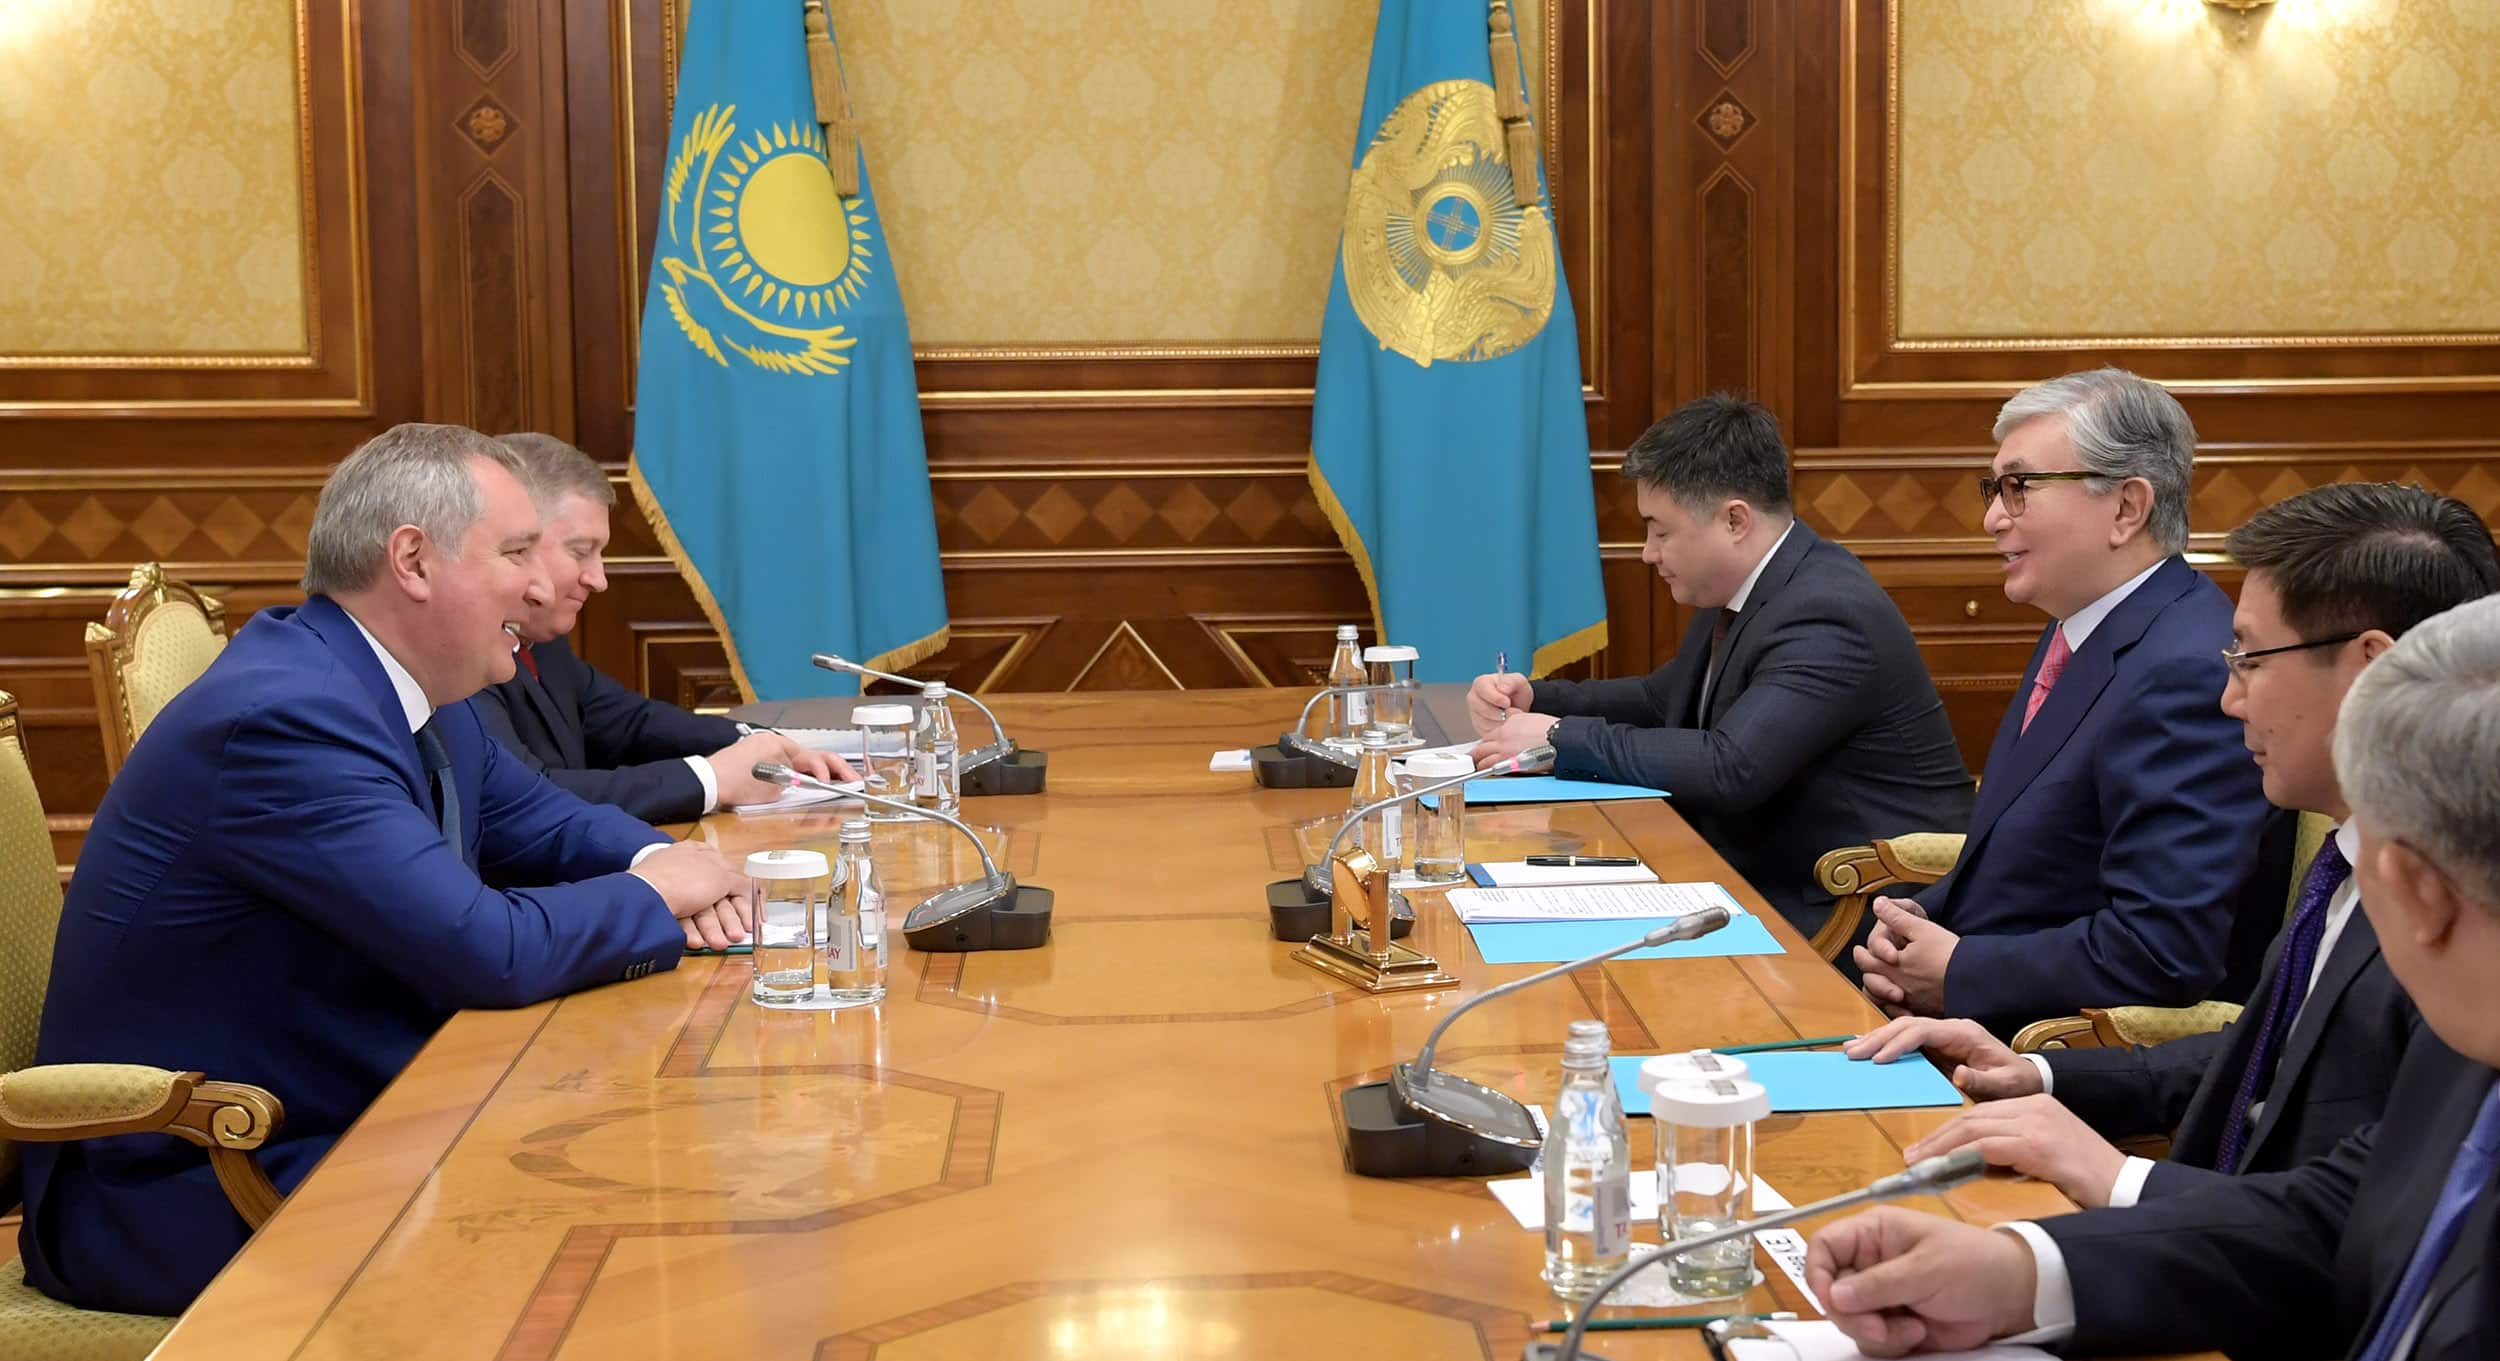 Қасым-Жомарт Тоқаев Дмитрий Рогозинмен кездесті